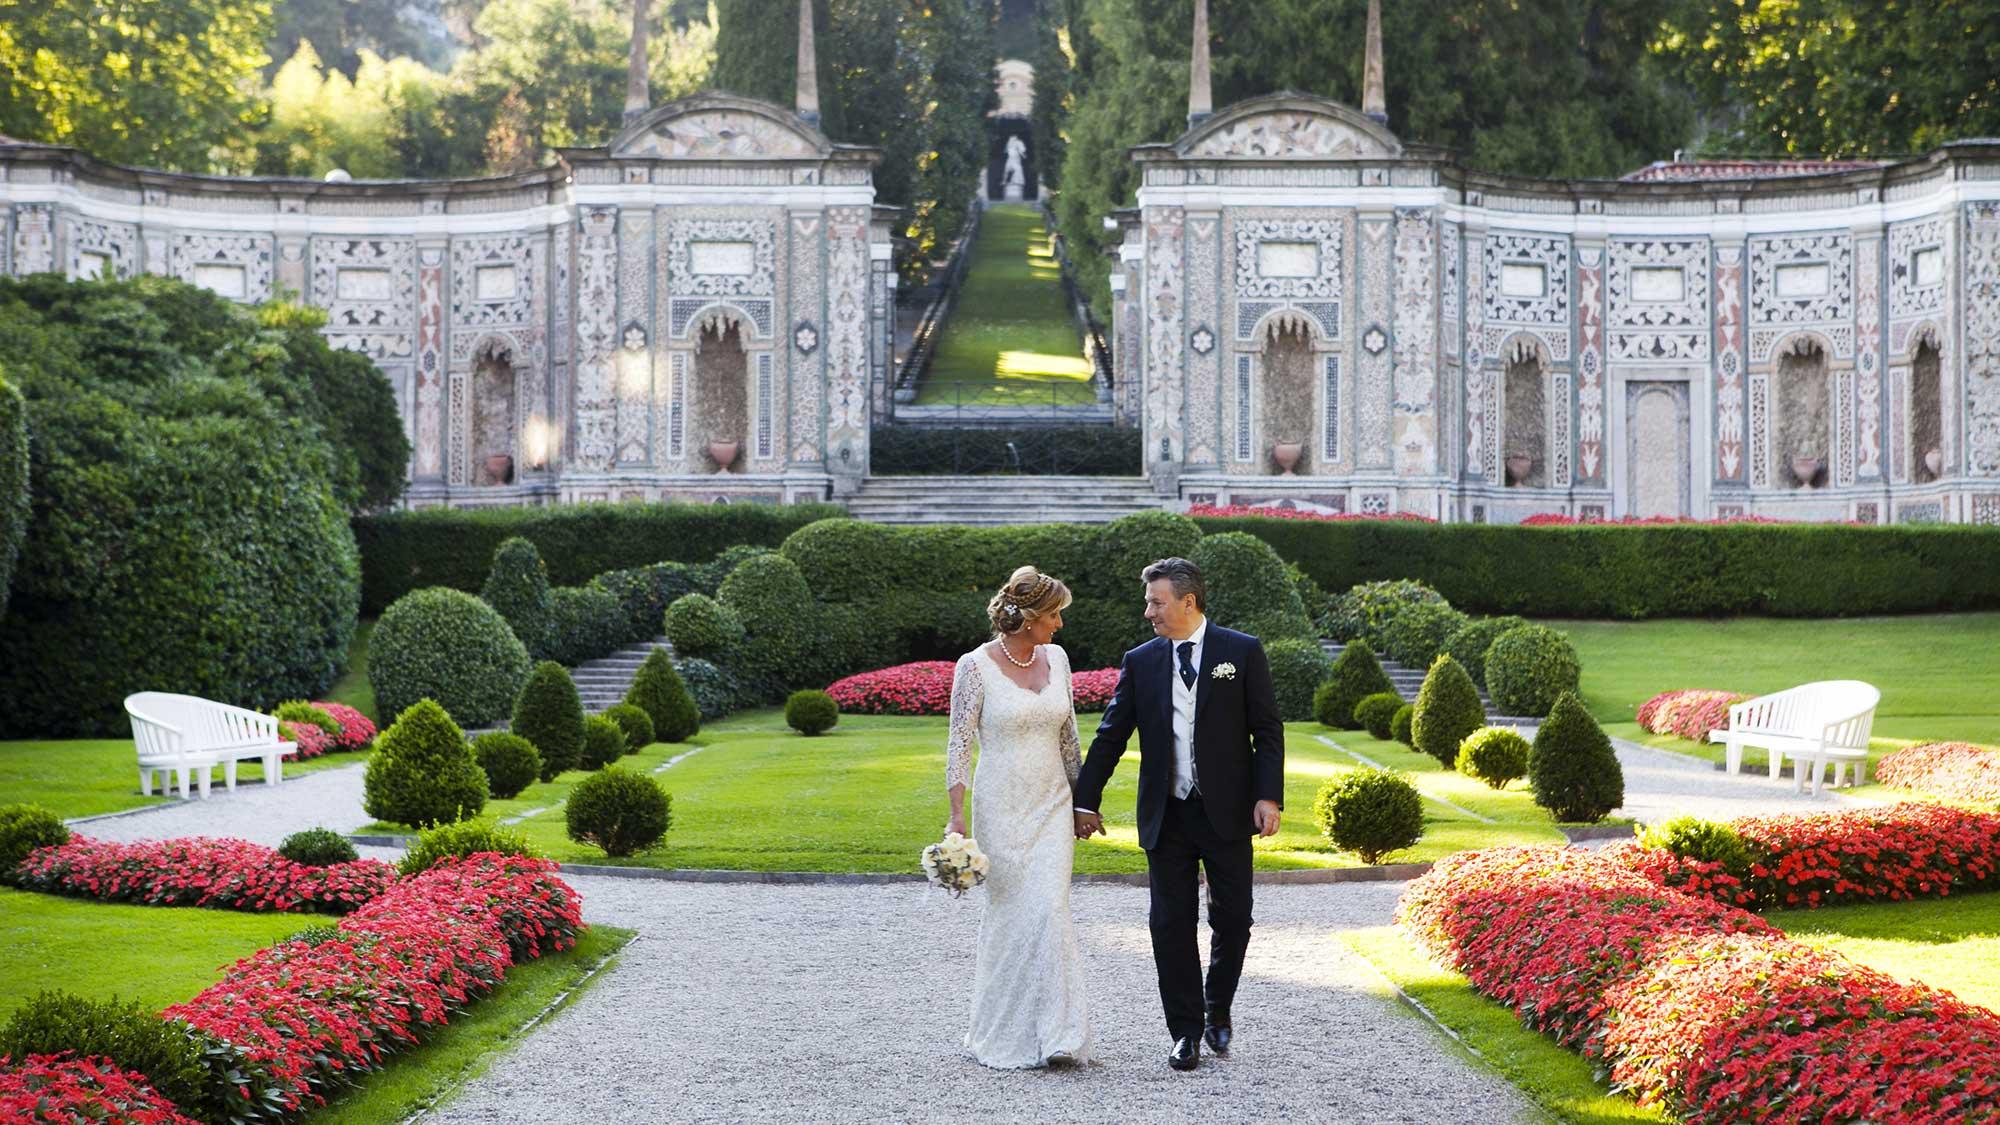 Matrimonio In Villa : Matrimonio villa d este gloria marco women in wedding